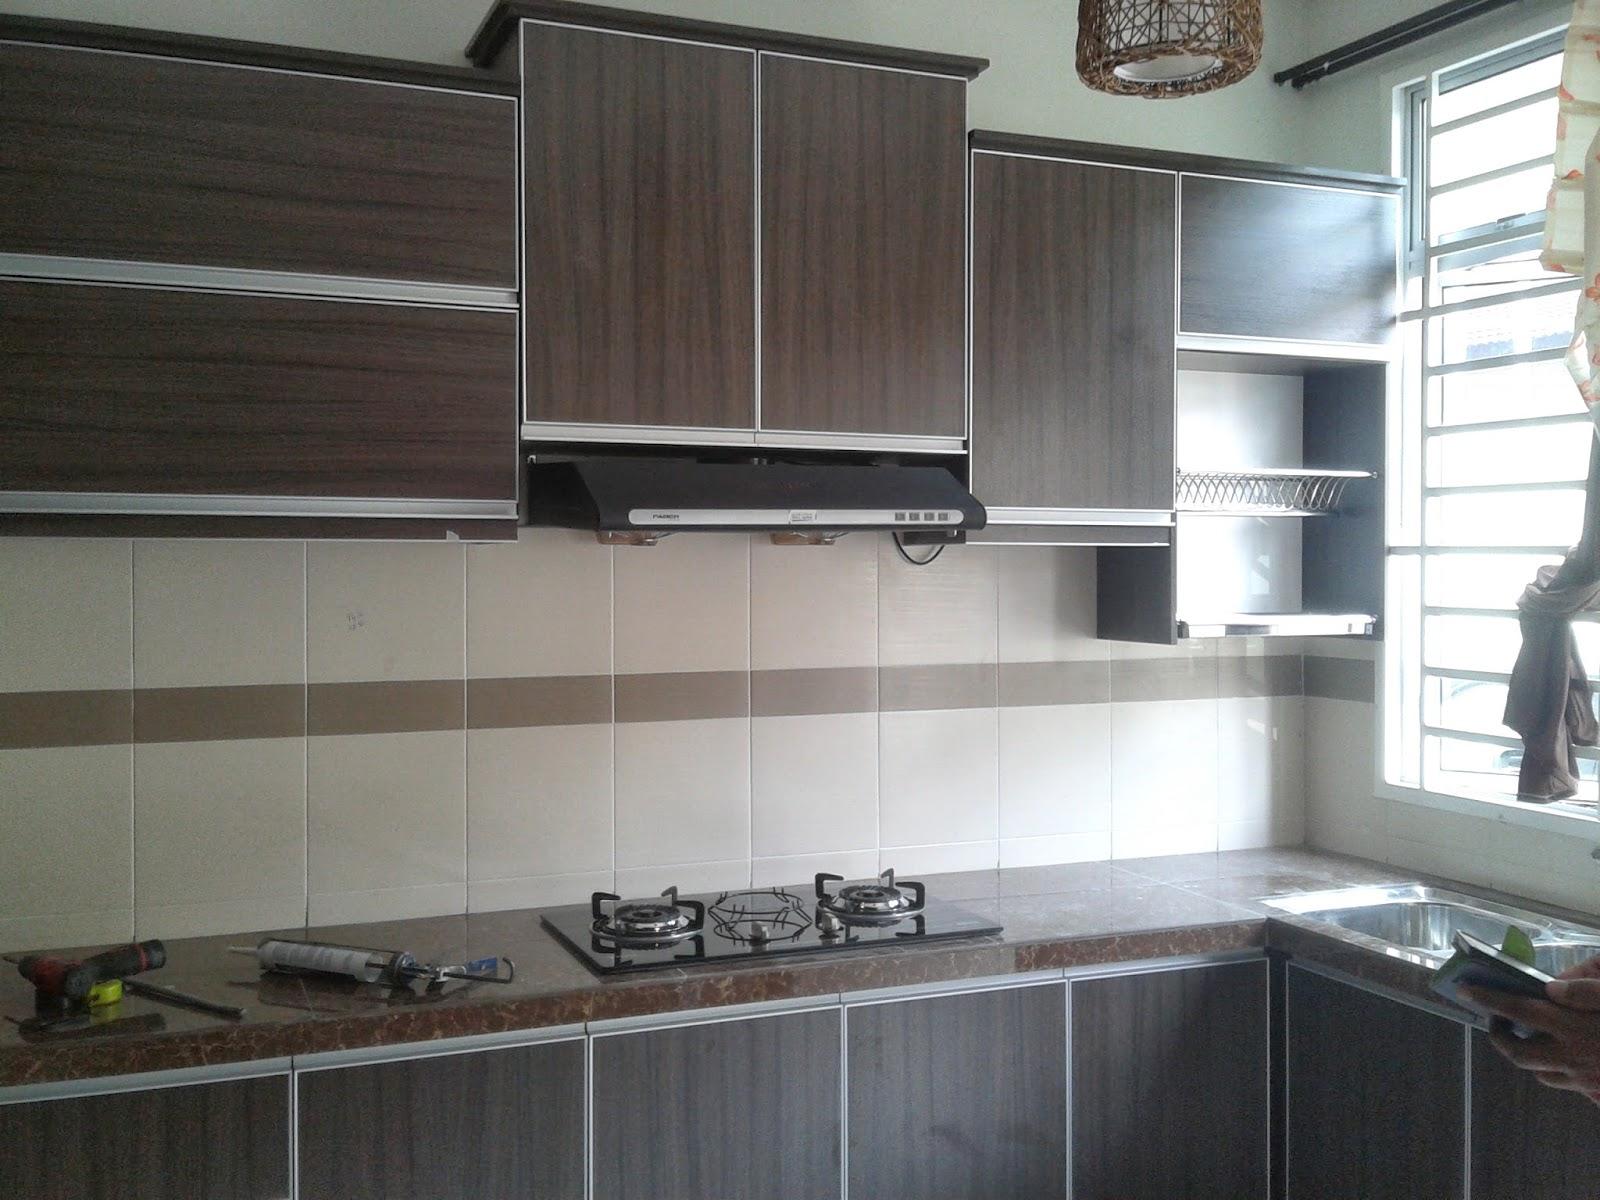 Nusa Intan Seremban Kabinet Dapur Dan Meja Konkrit Pamprey Cabinets